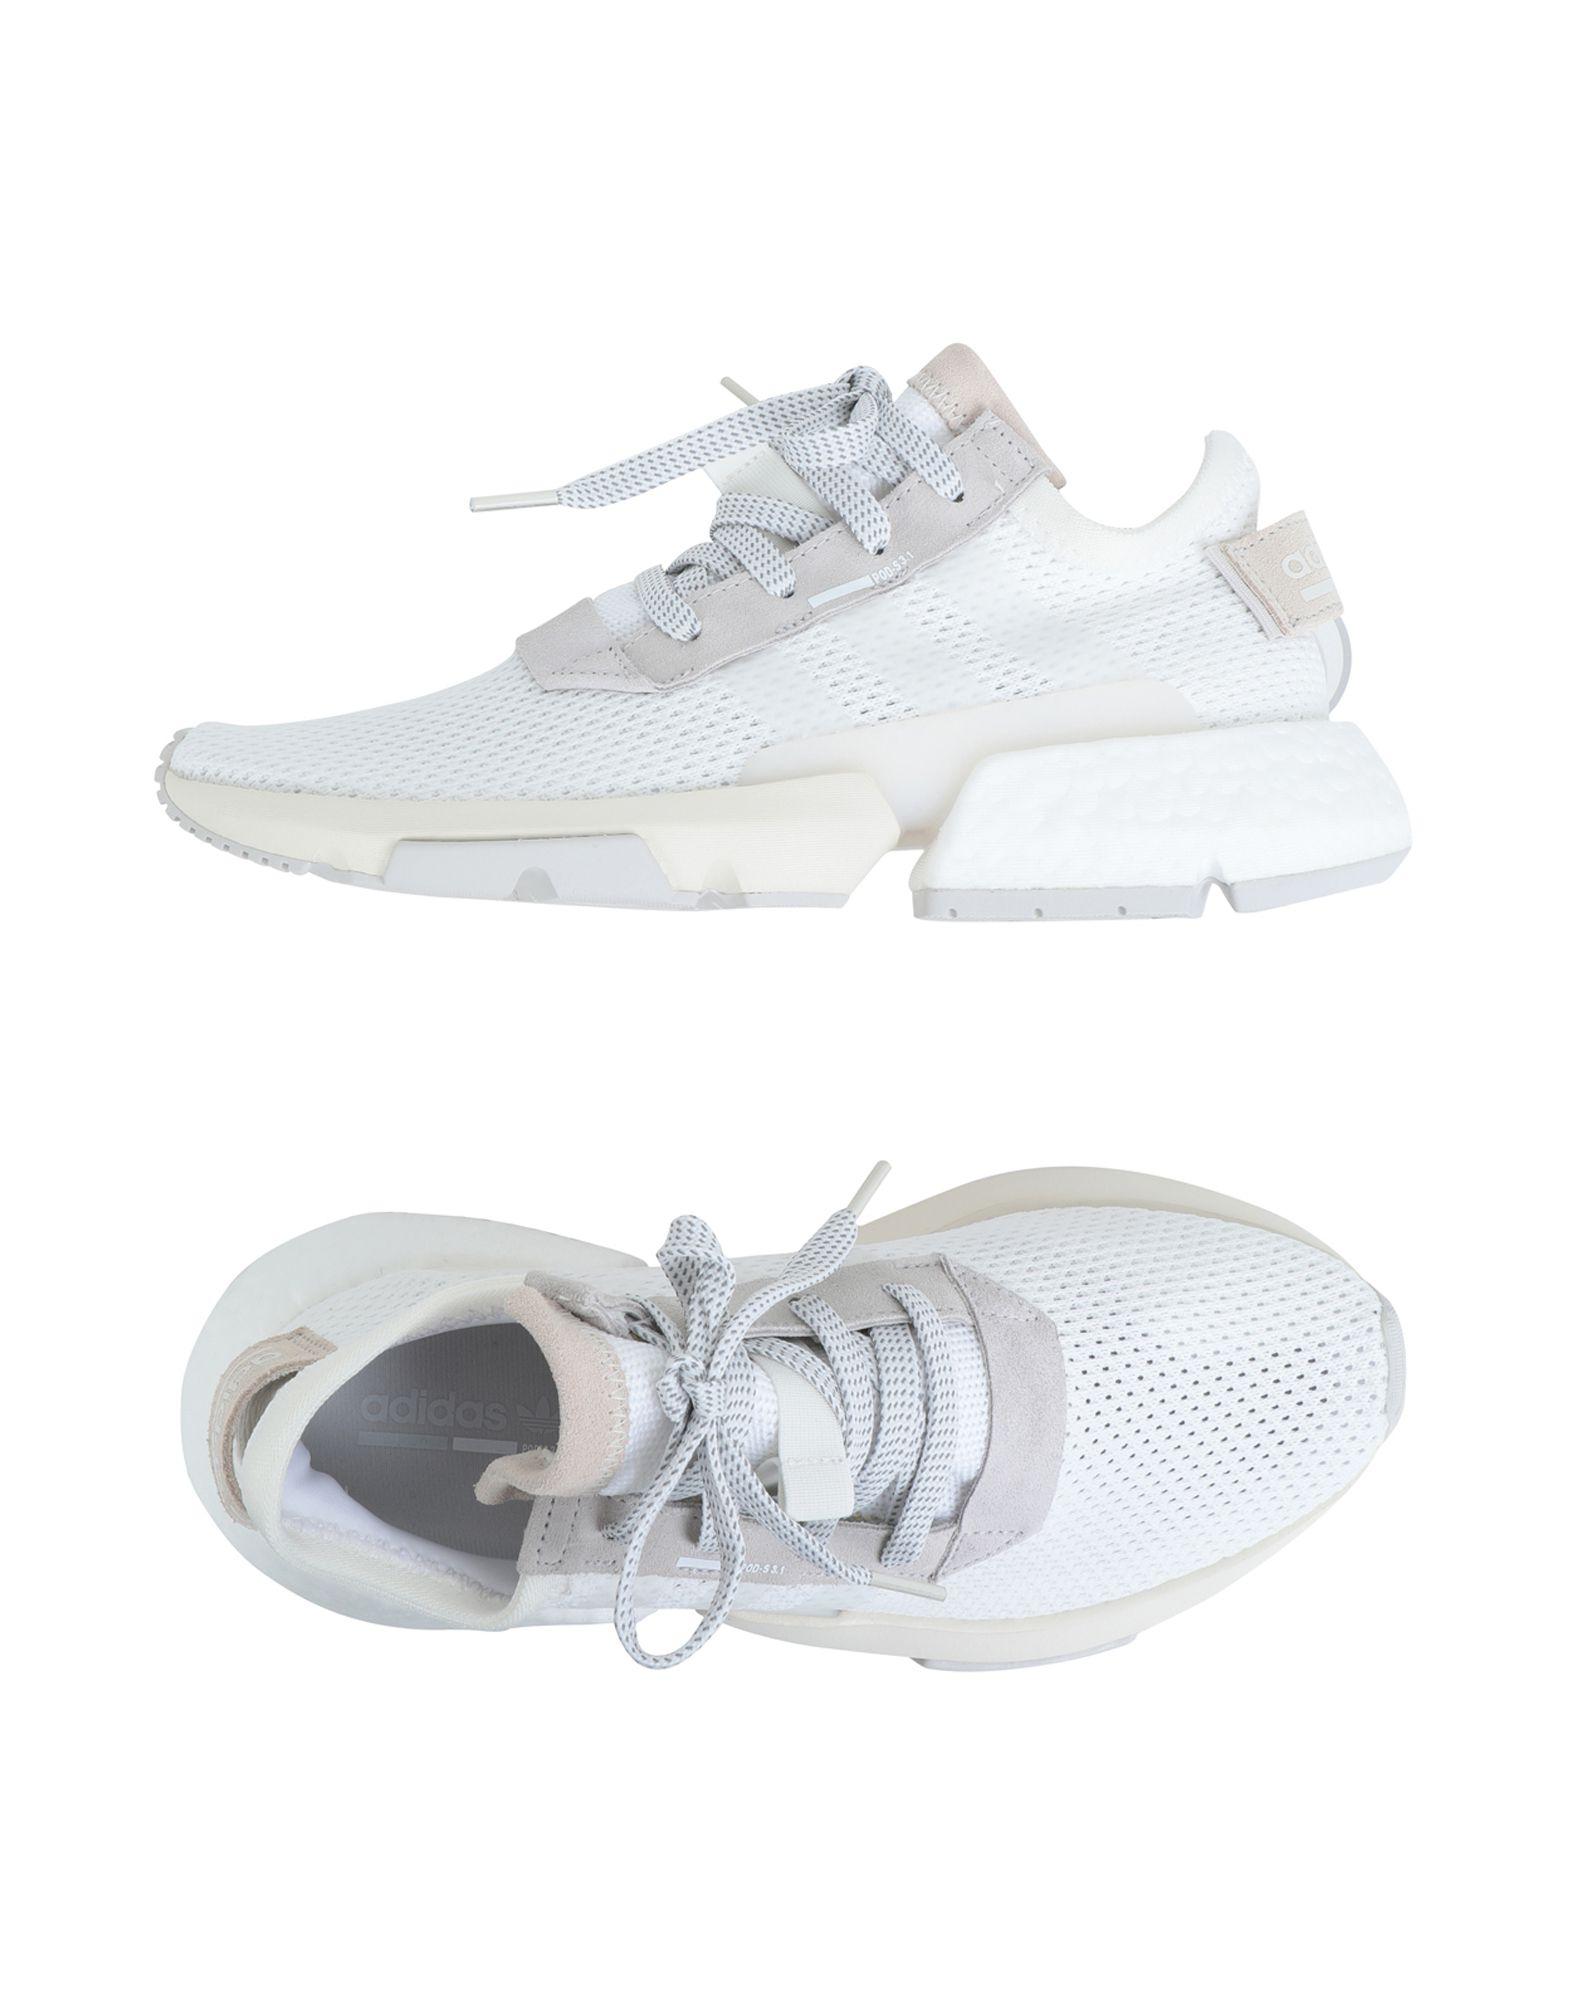 Adidas Originals Pod-S3.1 - Sneakers - Women Adidas Originals Sneakers Kingdom online on  United Kingdom Sneakers - 11568026EK 6e8cad